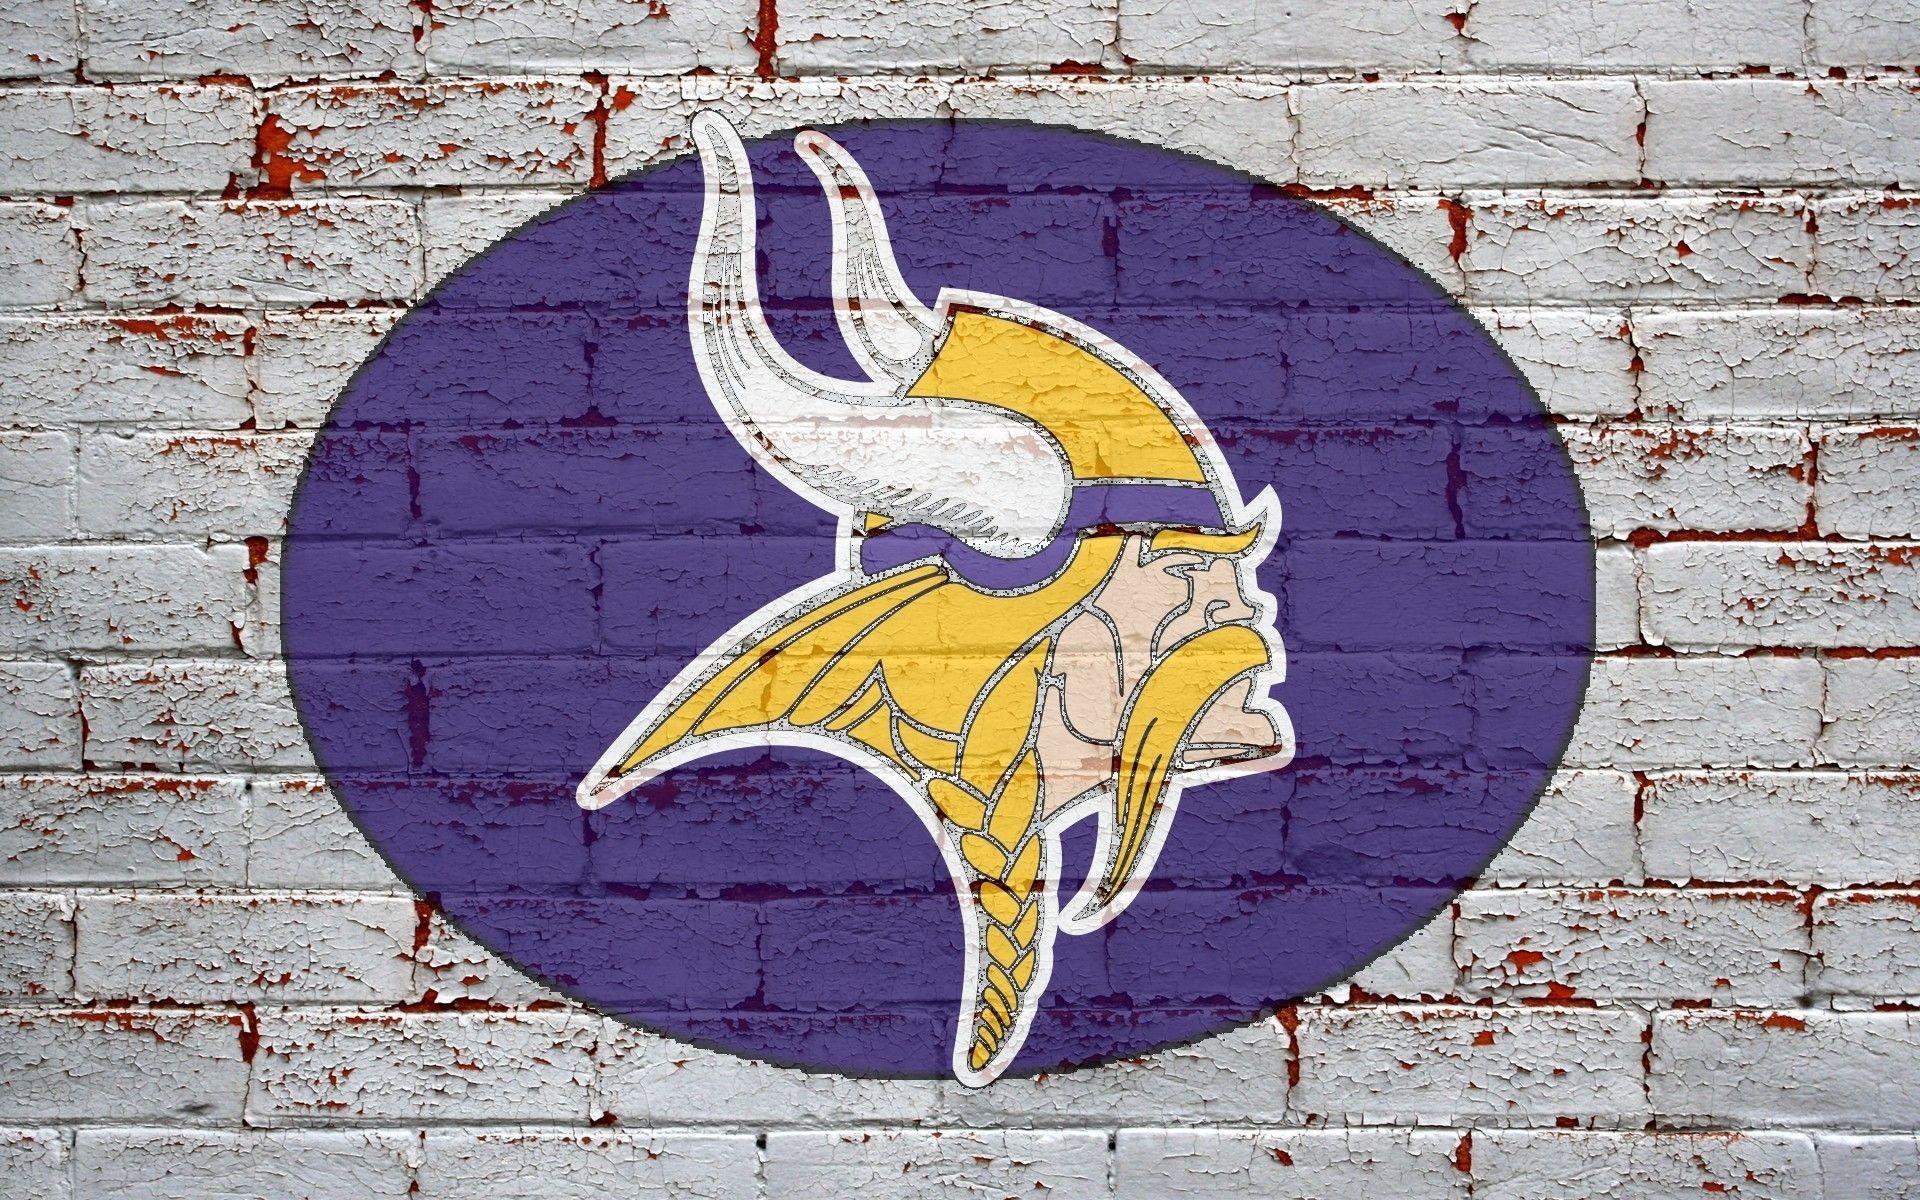 Res: 1920x1200, Minnesota Vikings HD Wallpaper 11 - 1920 X 1200